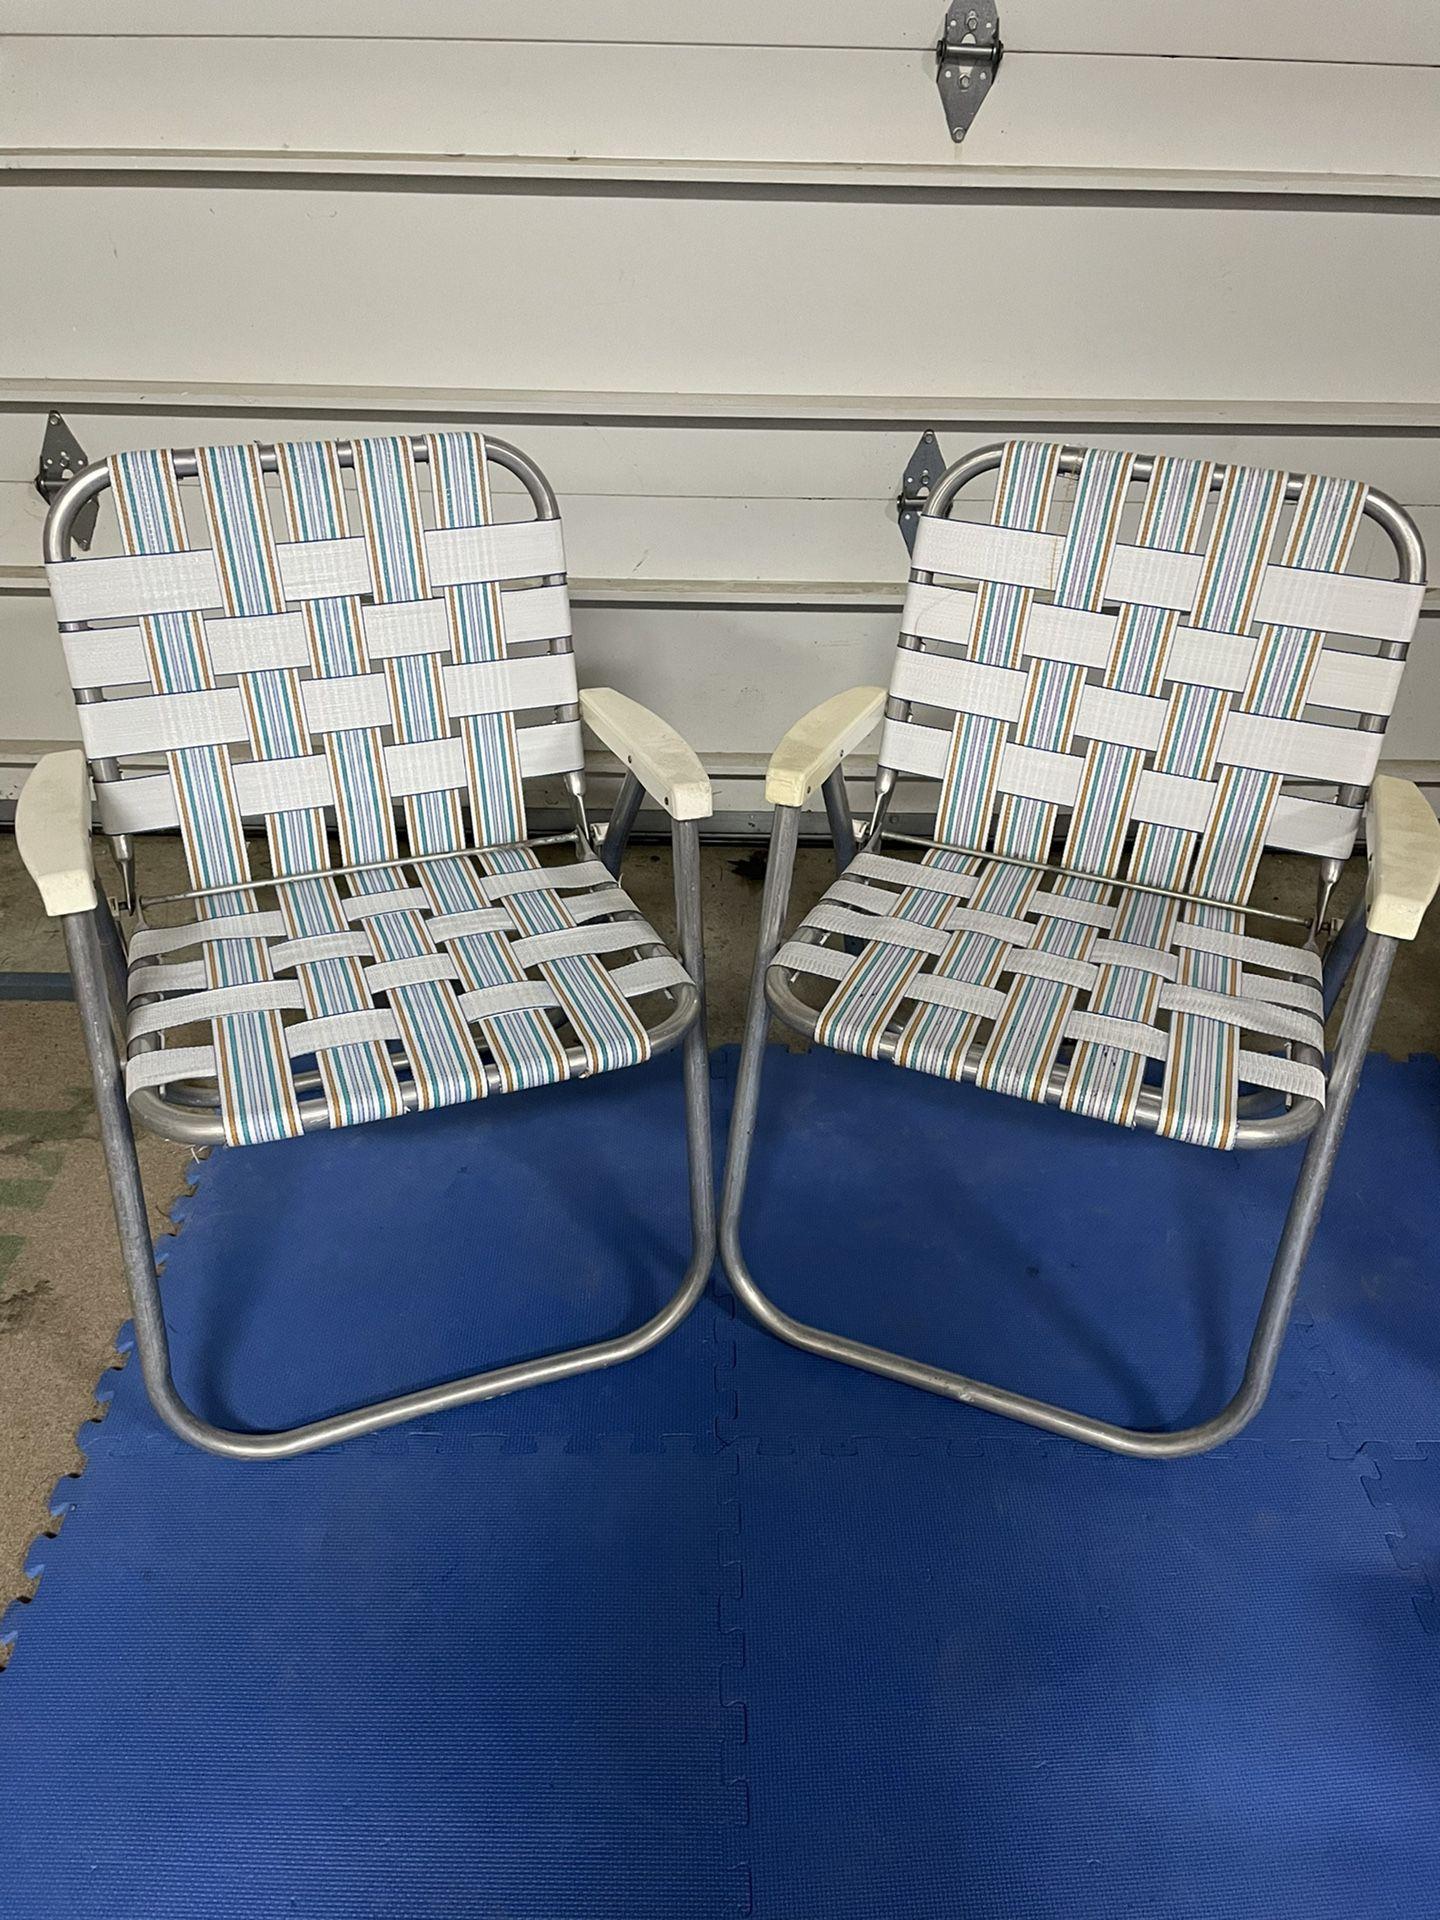 Vintage Aluminum Webbed Chairs (Pair) - White Stripes